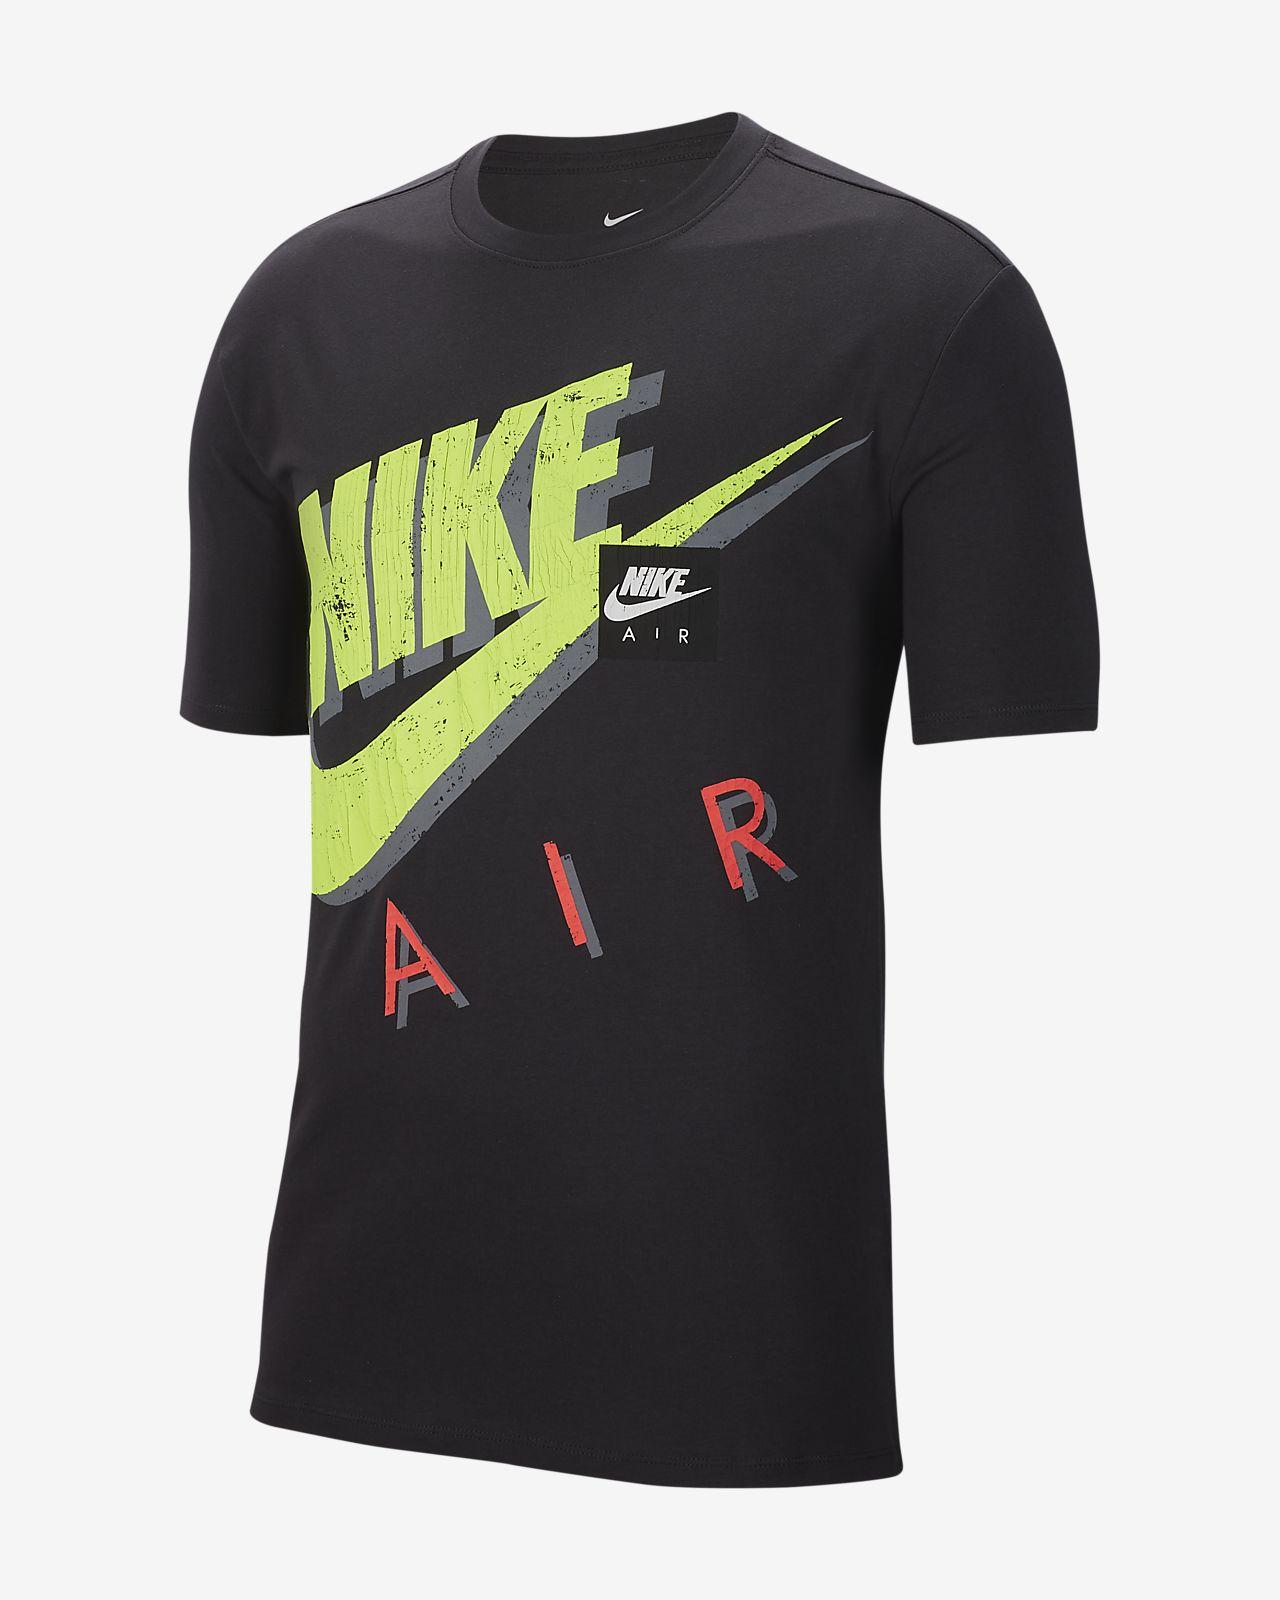 e6b42788b4bd Low Resolution Pánské tričko Nike Sportswear s potiskem Pánské tričko Nike  Sportswear s potiskem